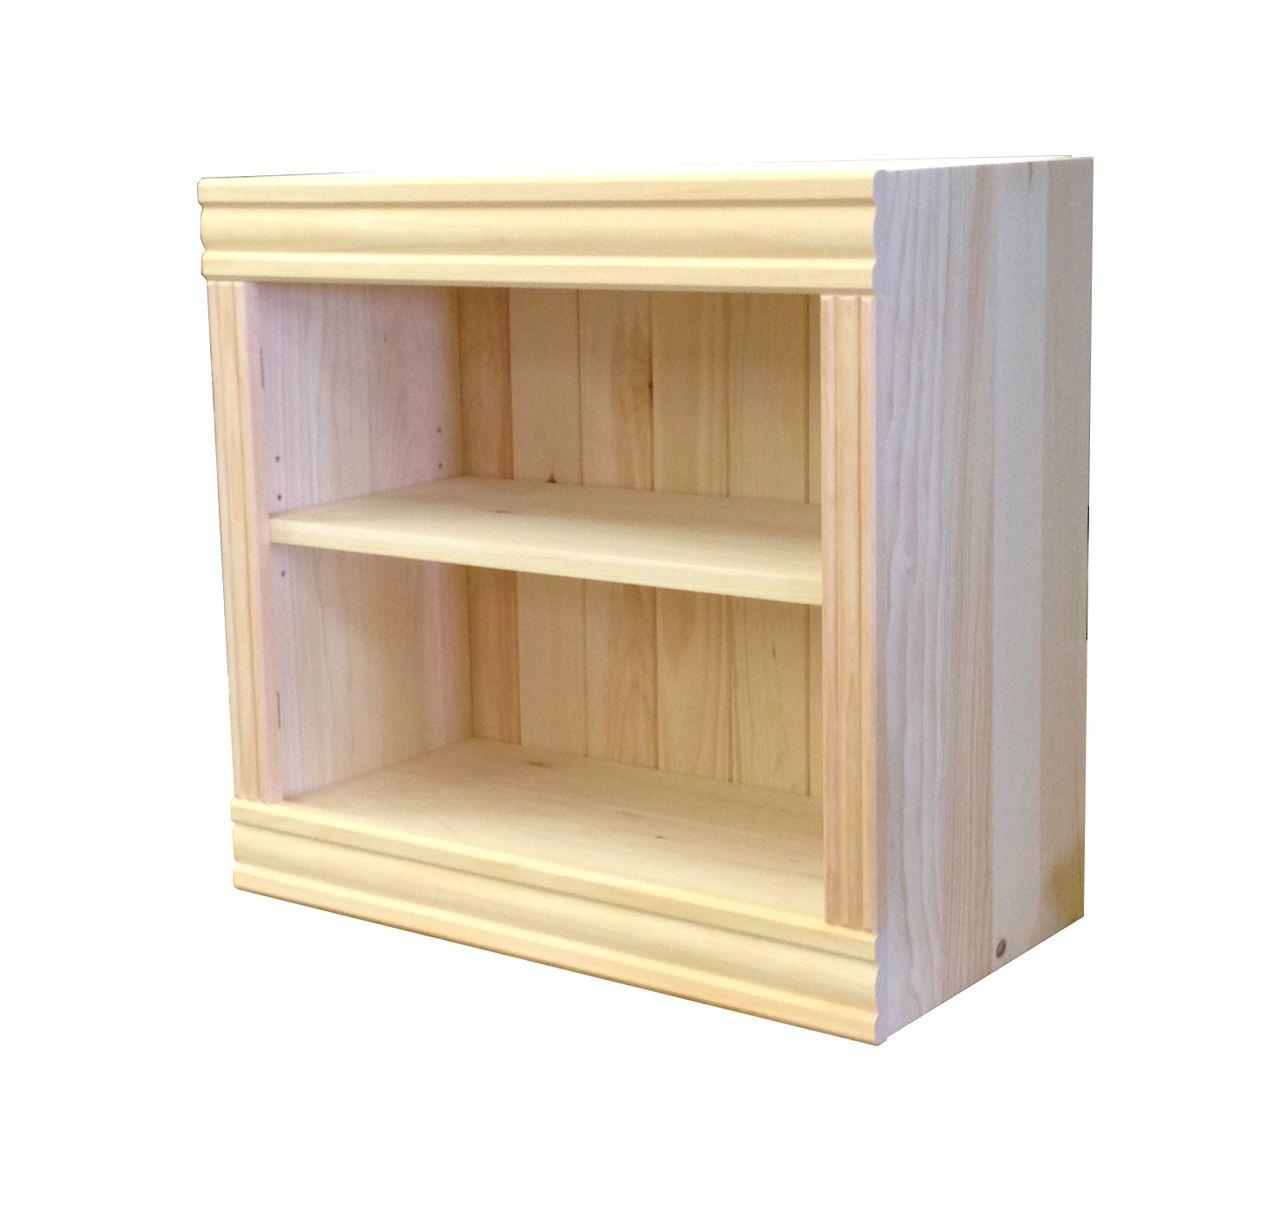 pine bookcases p pair open asp